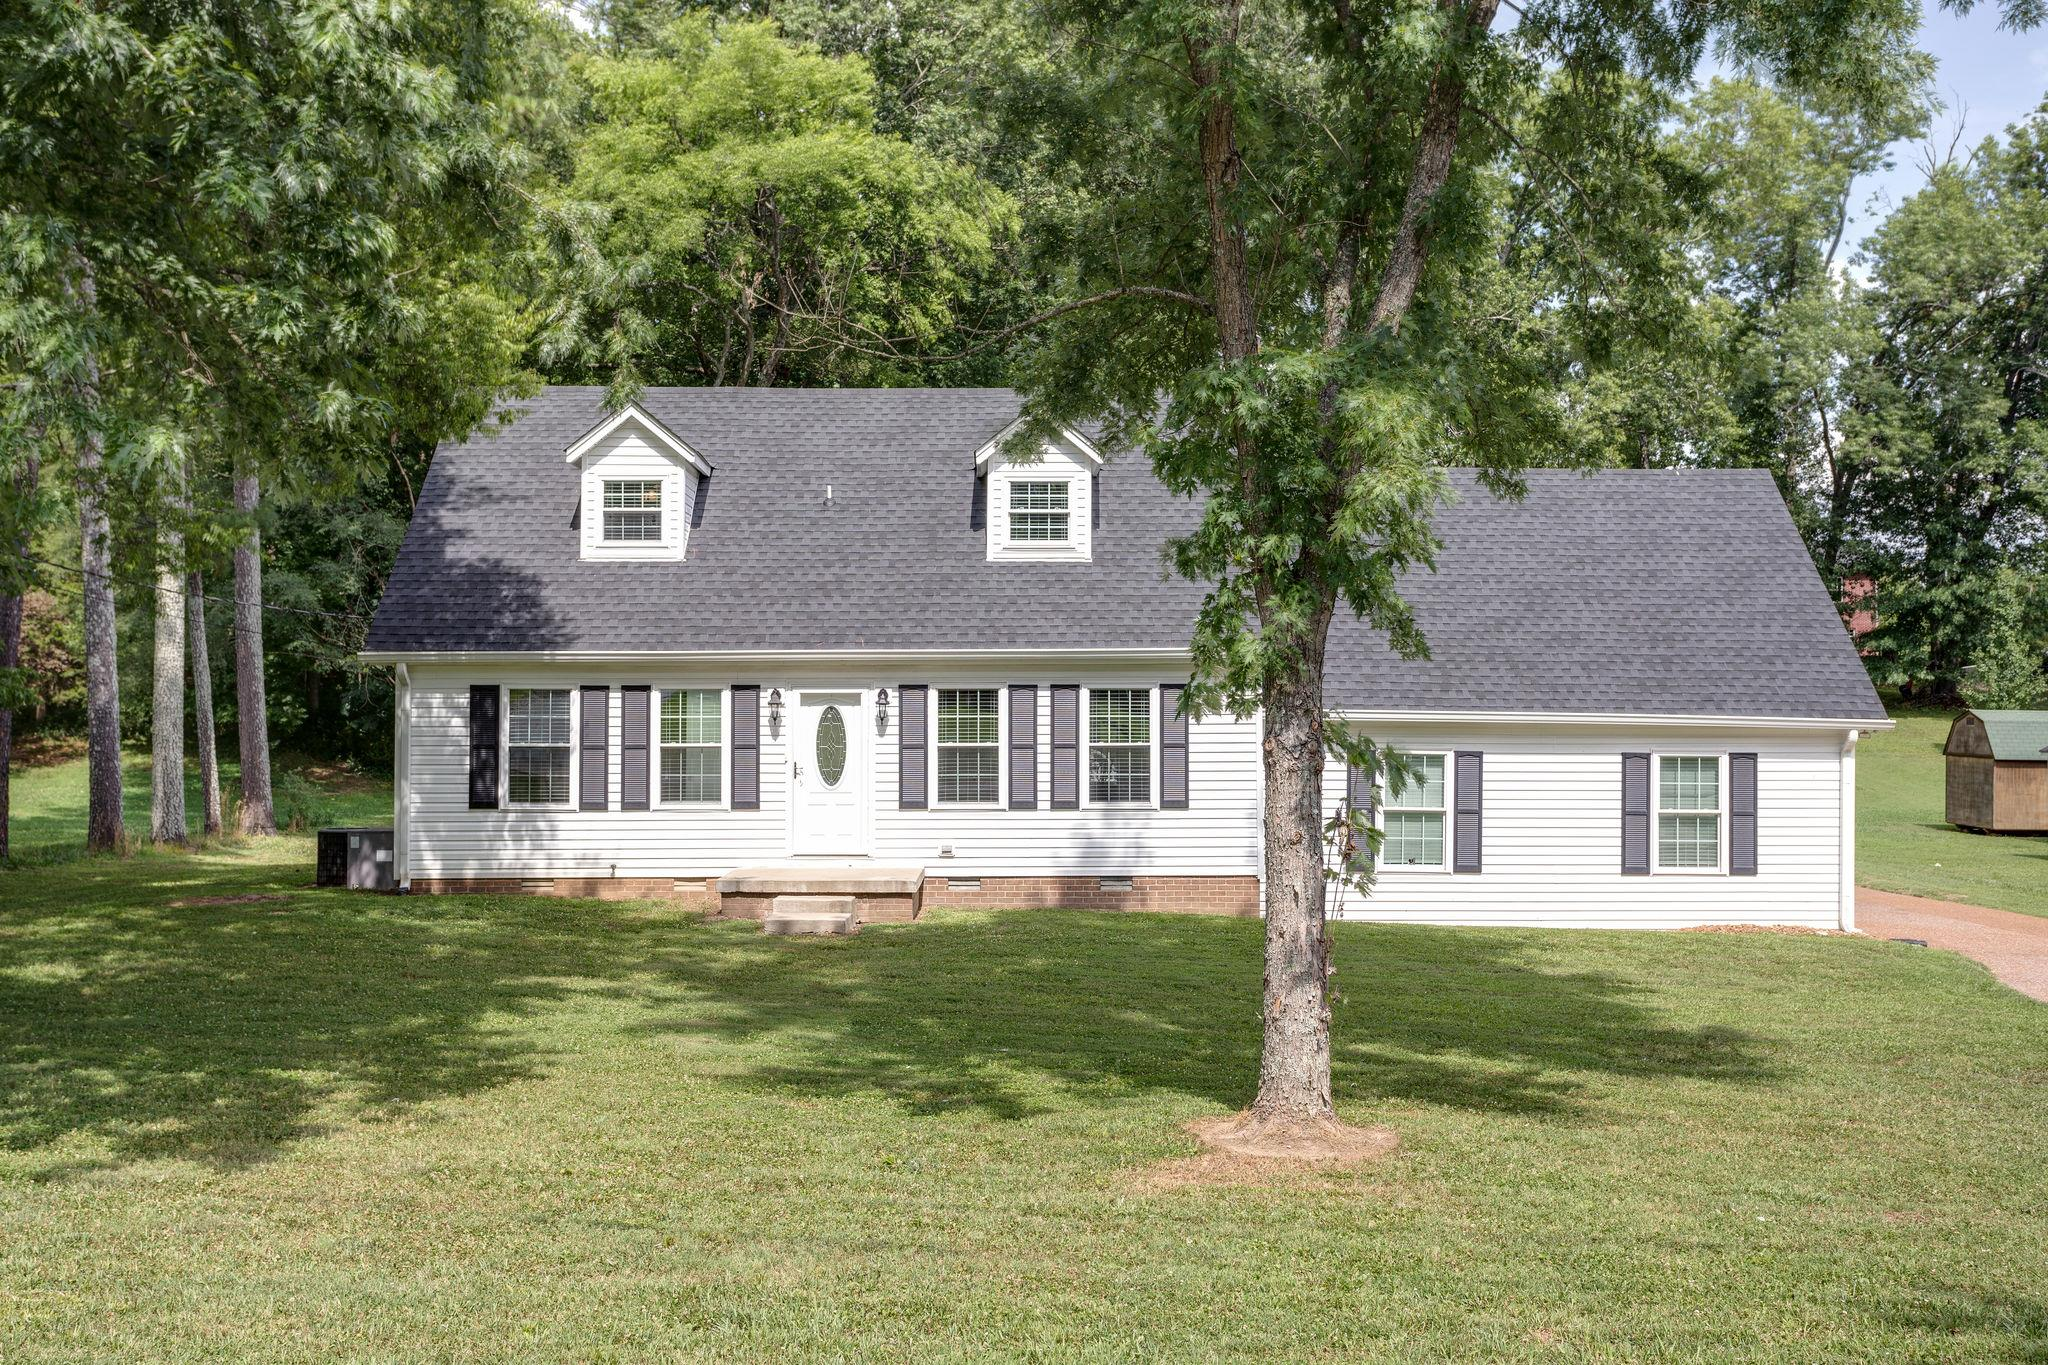 723 Ashwood Ave, Lewisburg, TN 37091 - Lewisburg, TN real estate listing